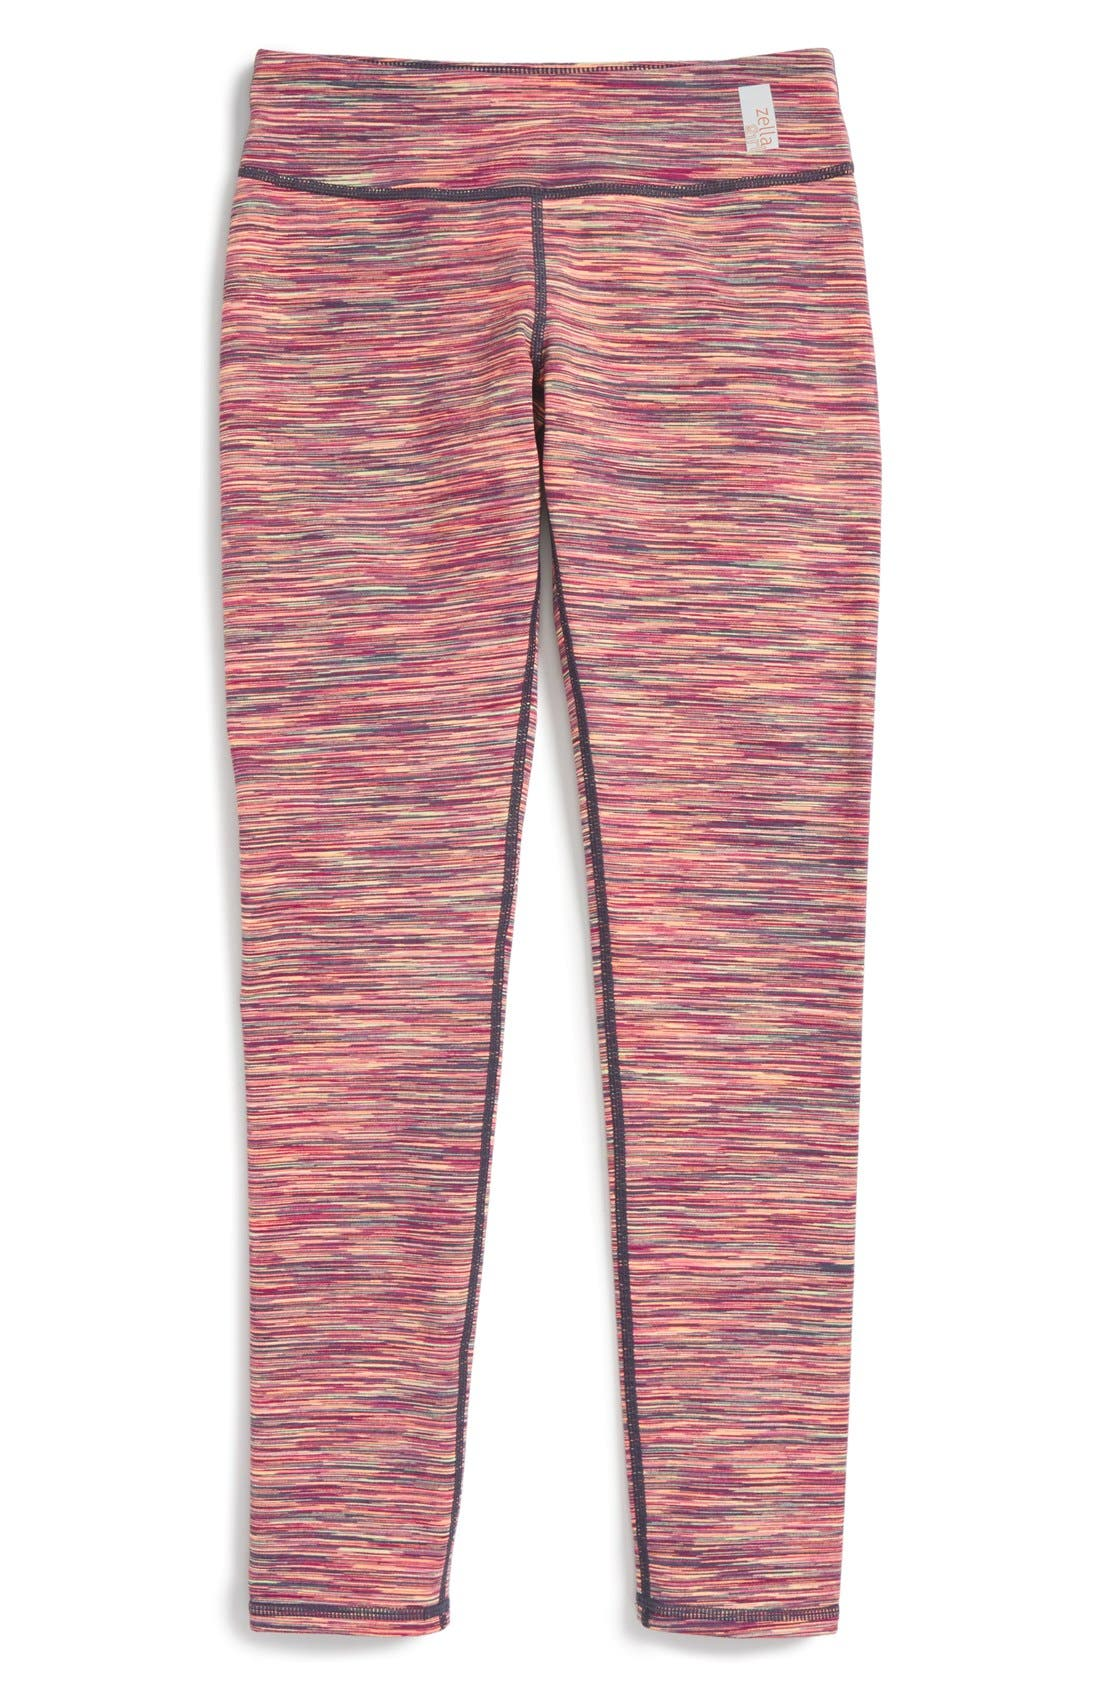 Alternate Image 1 Selected - Zella Girl 'Cosmic' Space Dye Leggings (Little Girls & Big Girls)